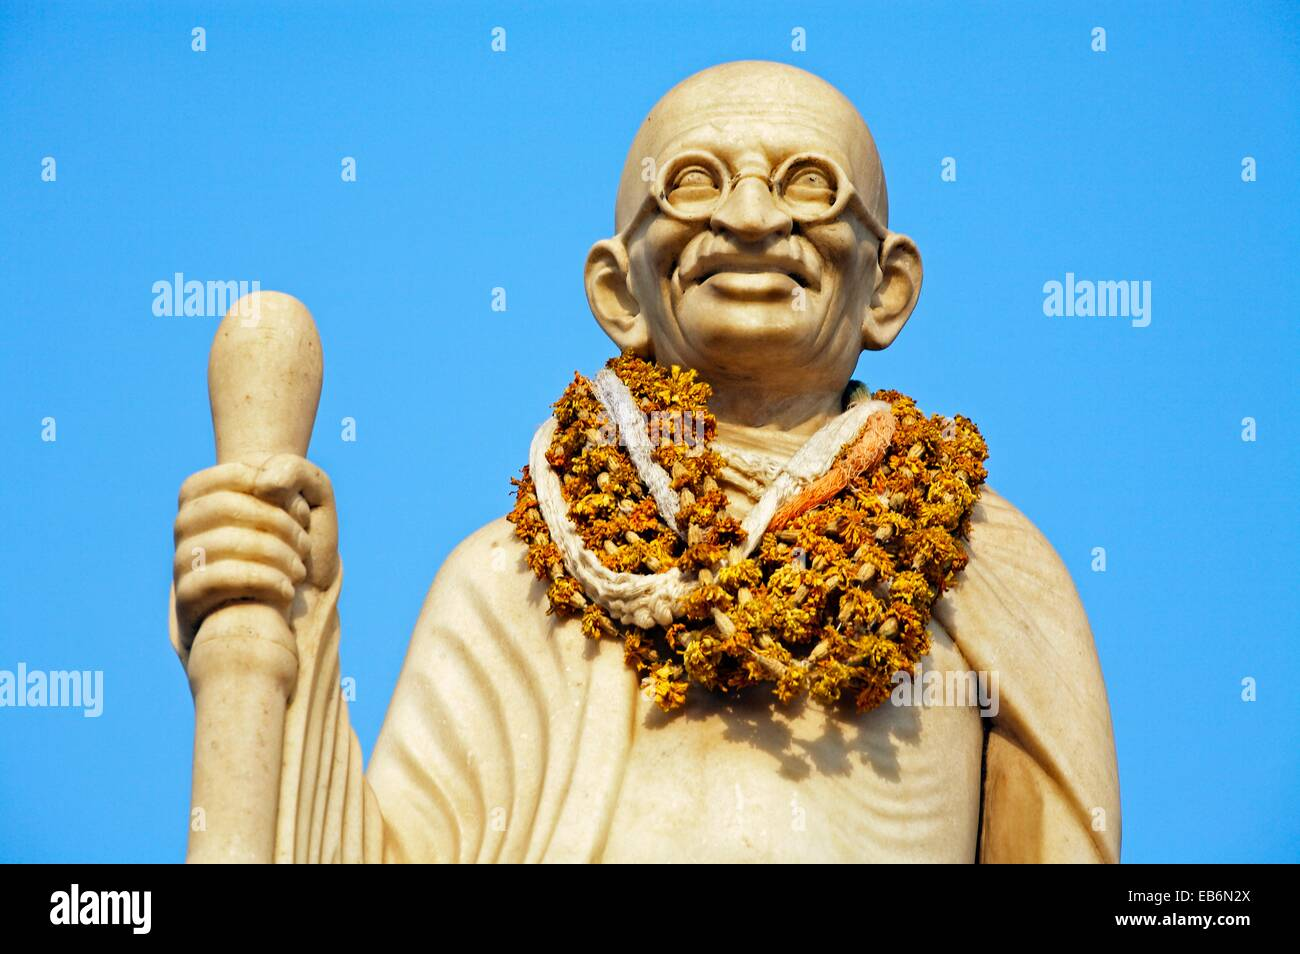 Estatua de Mahatma Gandhi 1869-1948 , Jaipur, Rajasthan, India. Foto de stock